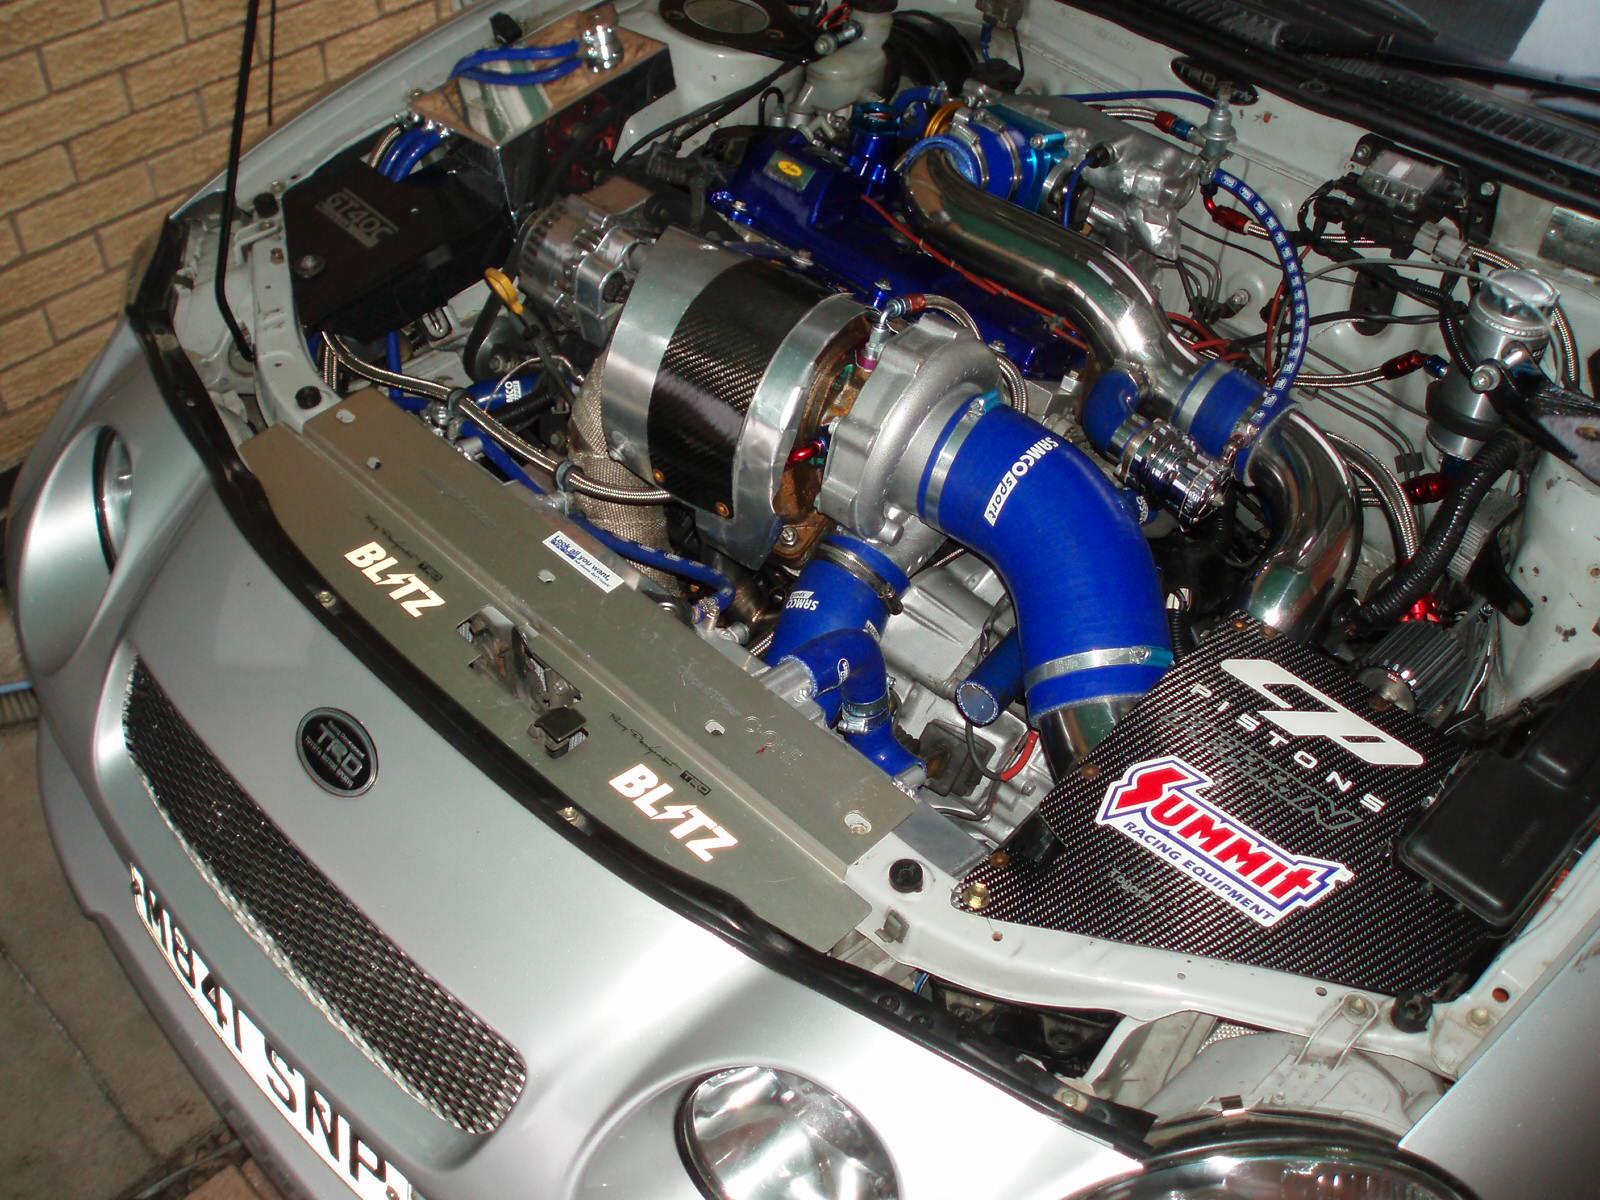 Kekurangan Toyota Celica Turbo Tangguh